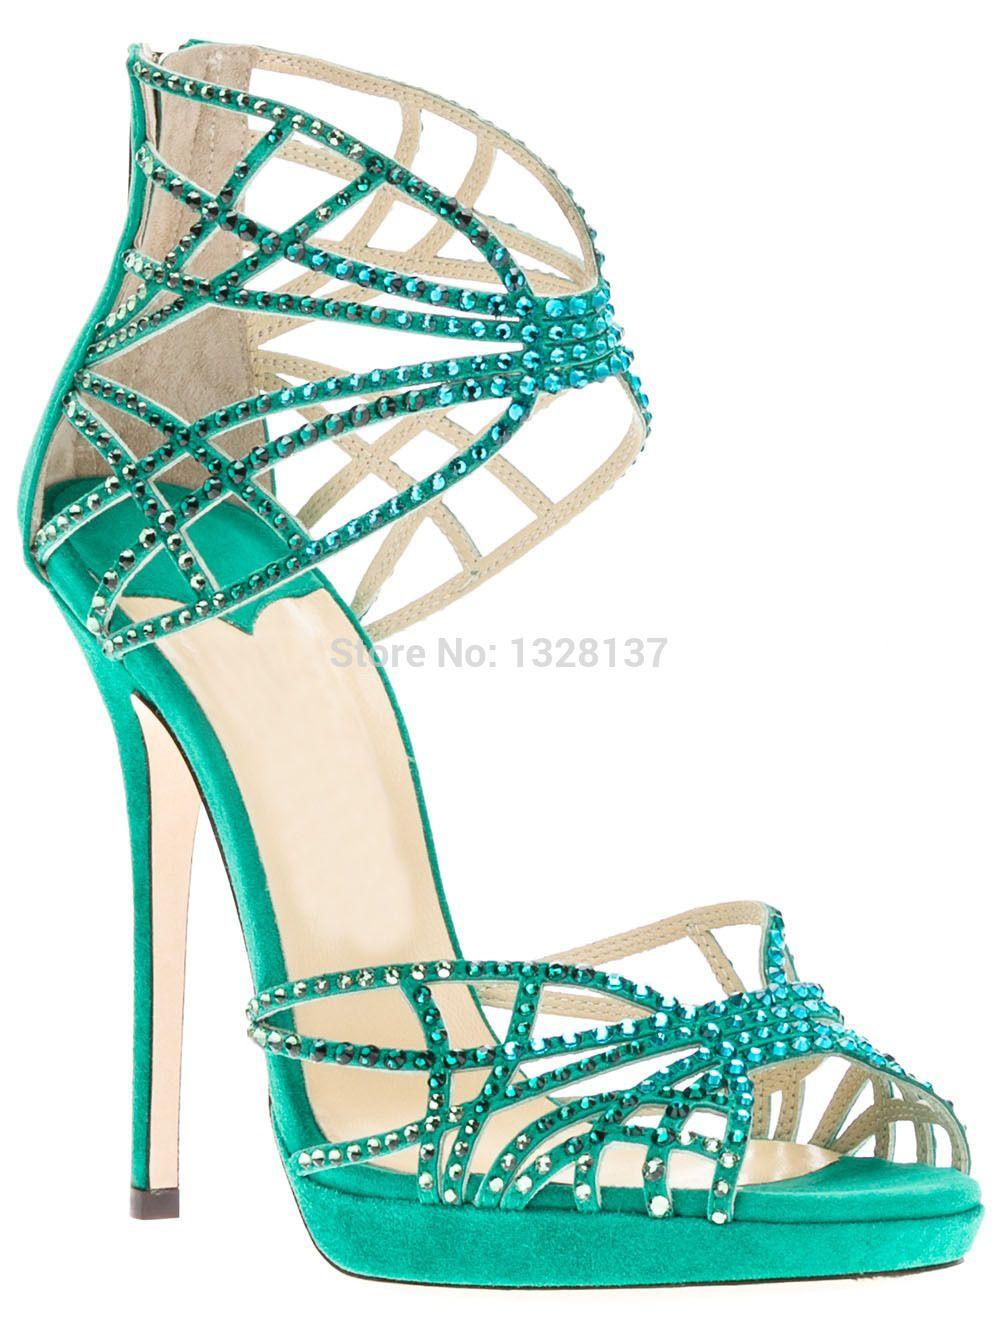 Blue Satin High Heels